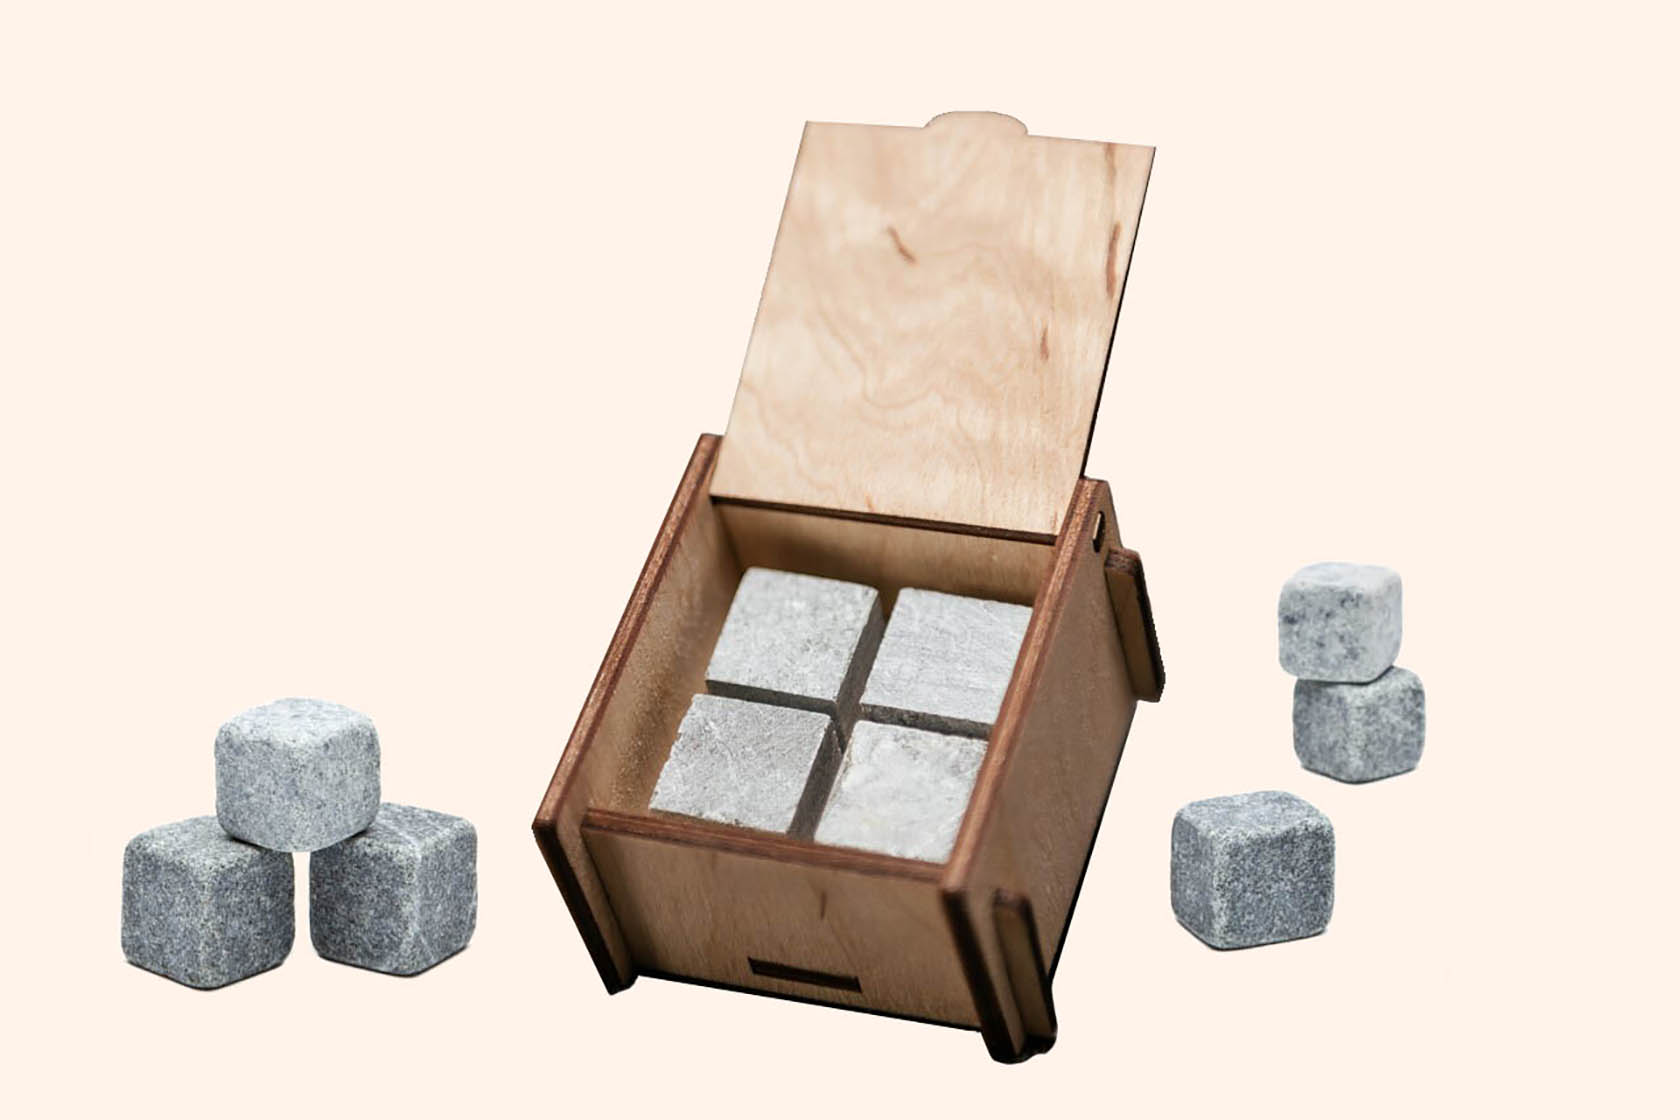 Набор камней для виски в деревянной коробке Whiskey Stones